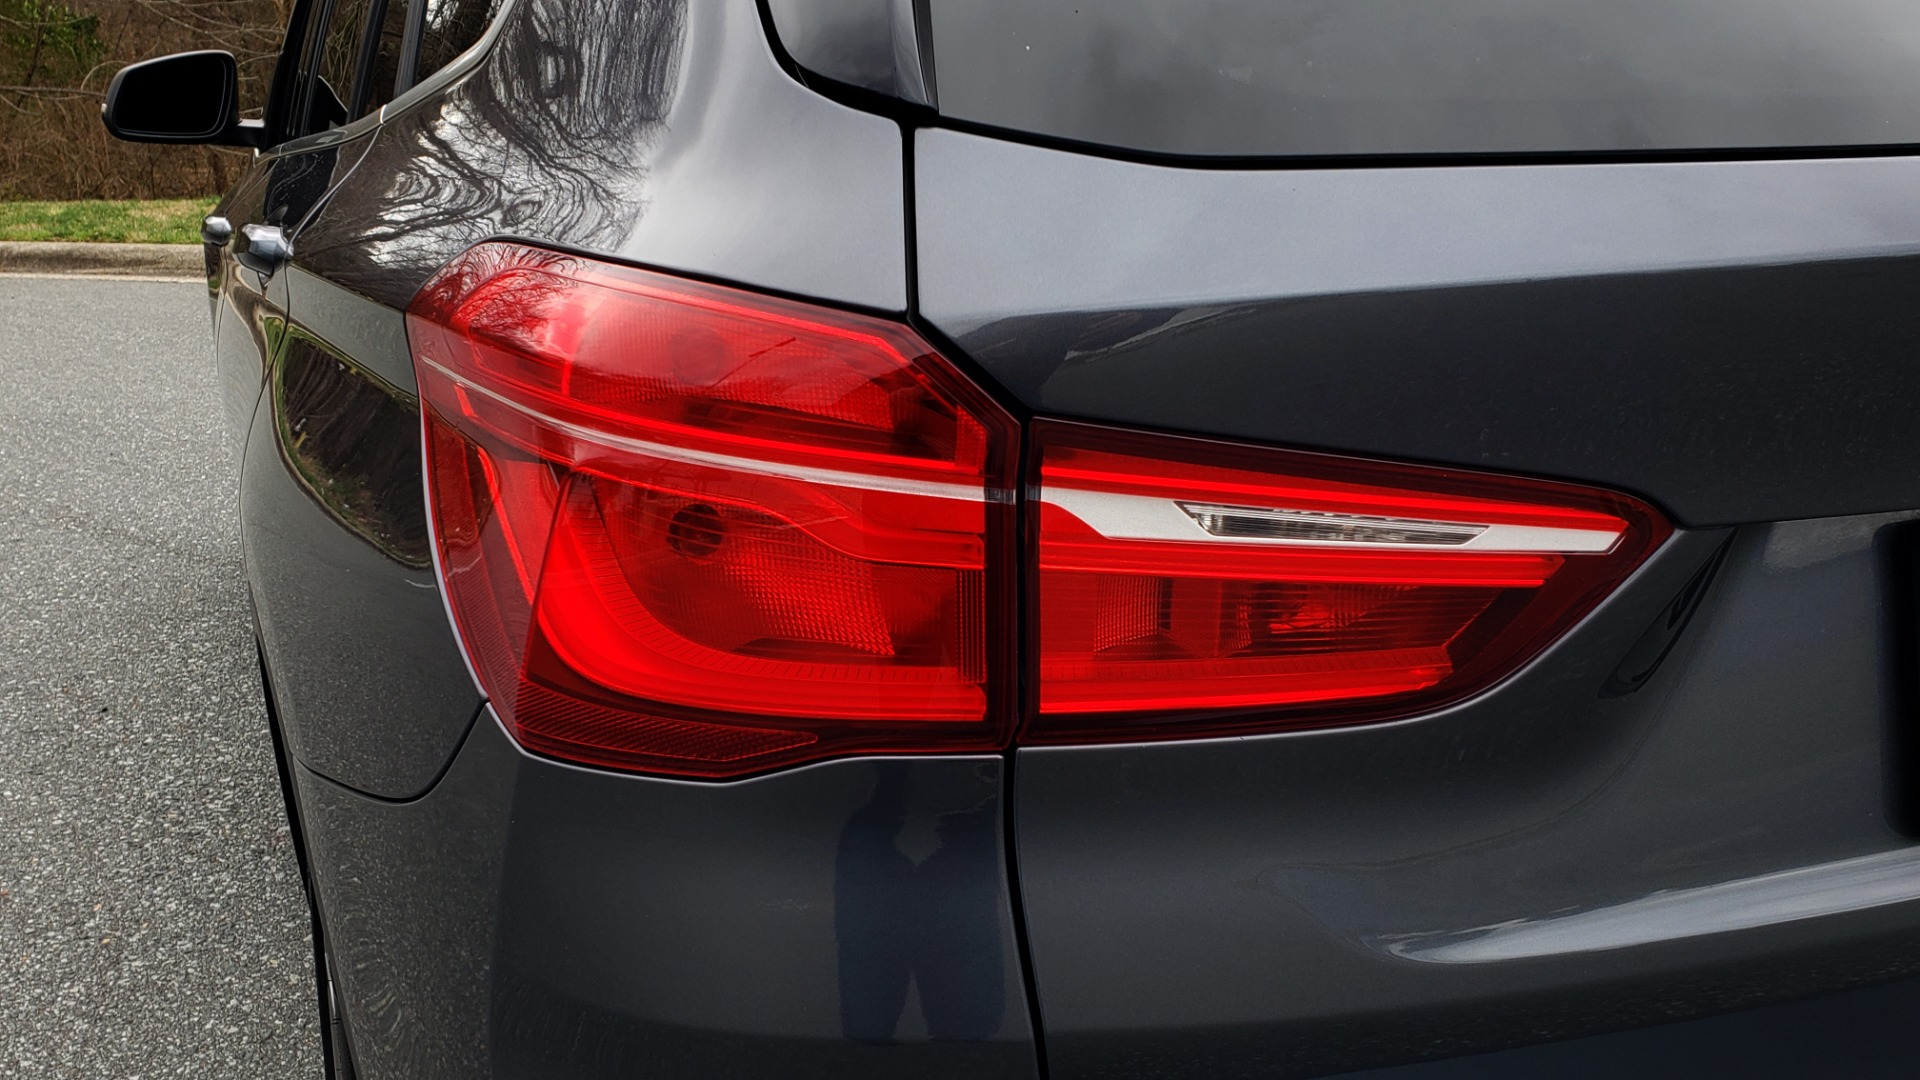 Used 2017 BMW X1 XDRIVE28I / PREM PKG / DRIVER ASST / NAV / CLD WTHR for sale Sold at Formula Imports in Charlotte NC 28227 30